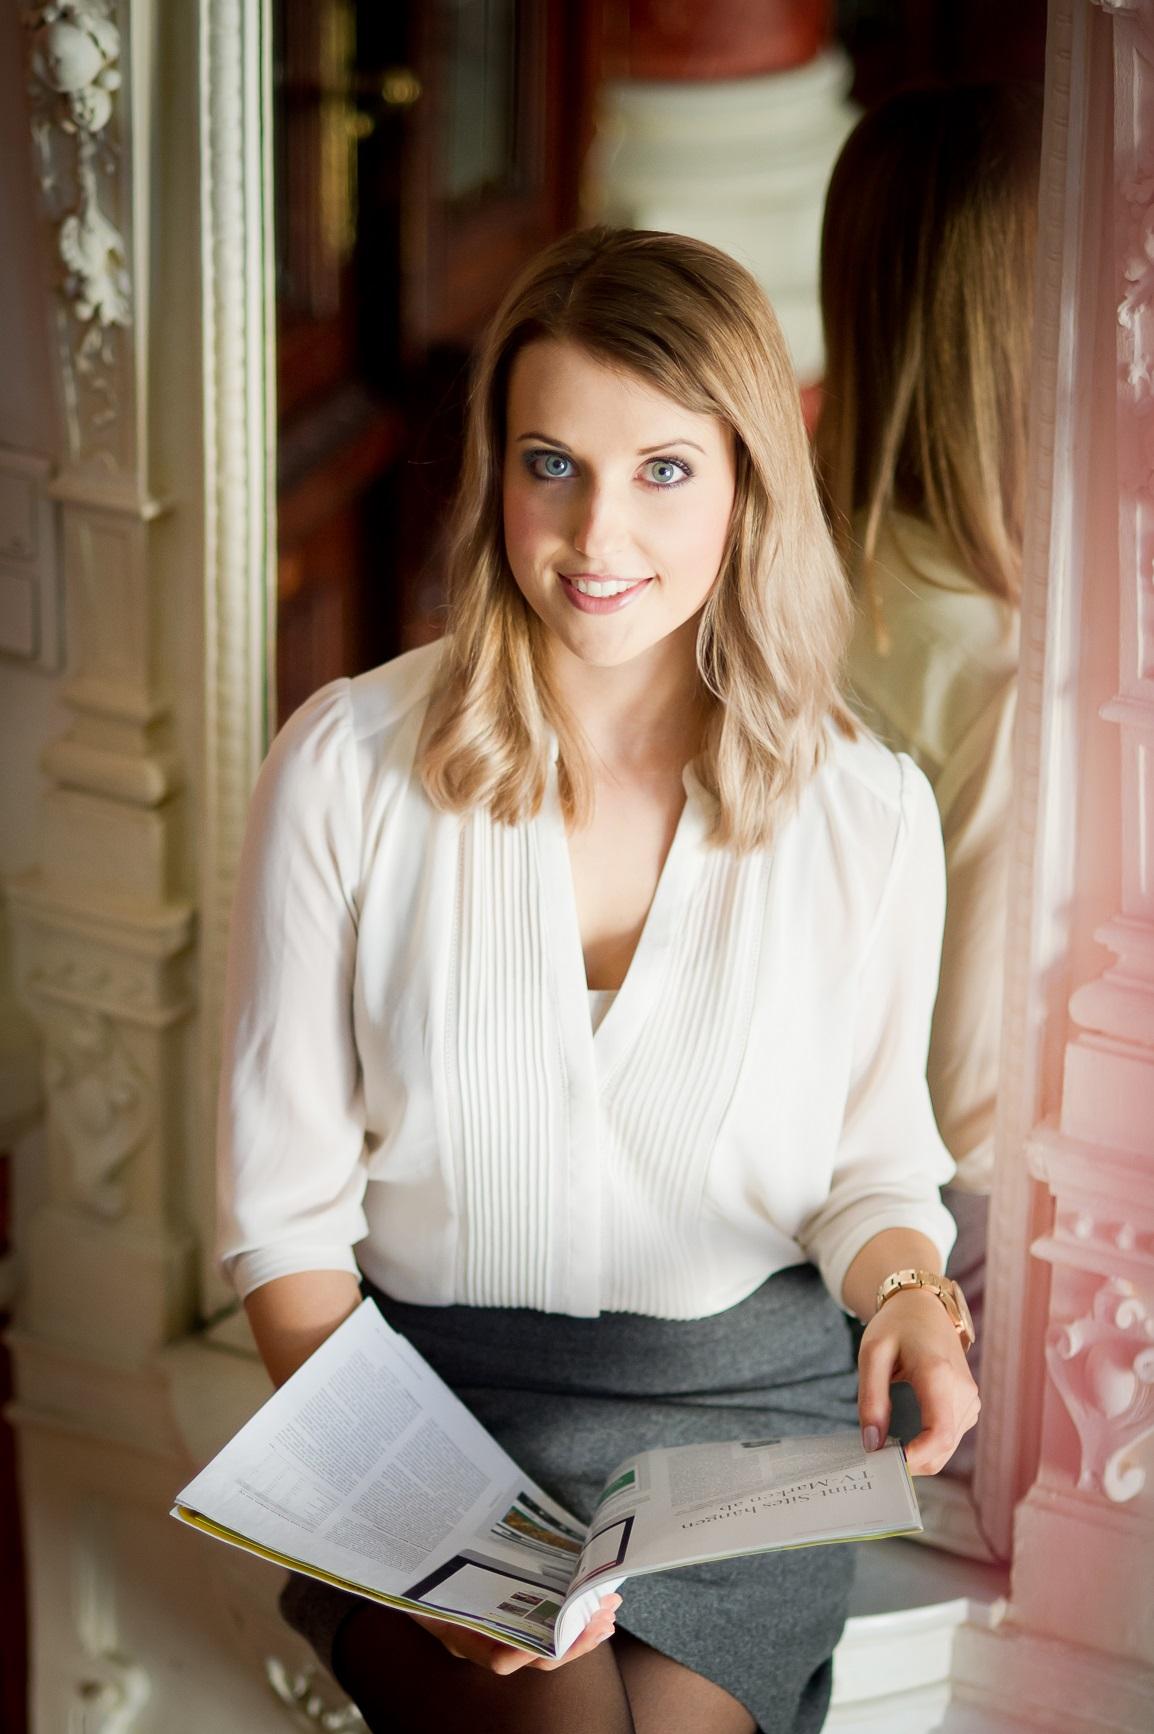 Eva Sara Lenz von KMB| Wiesbaden